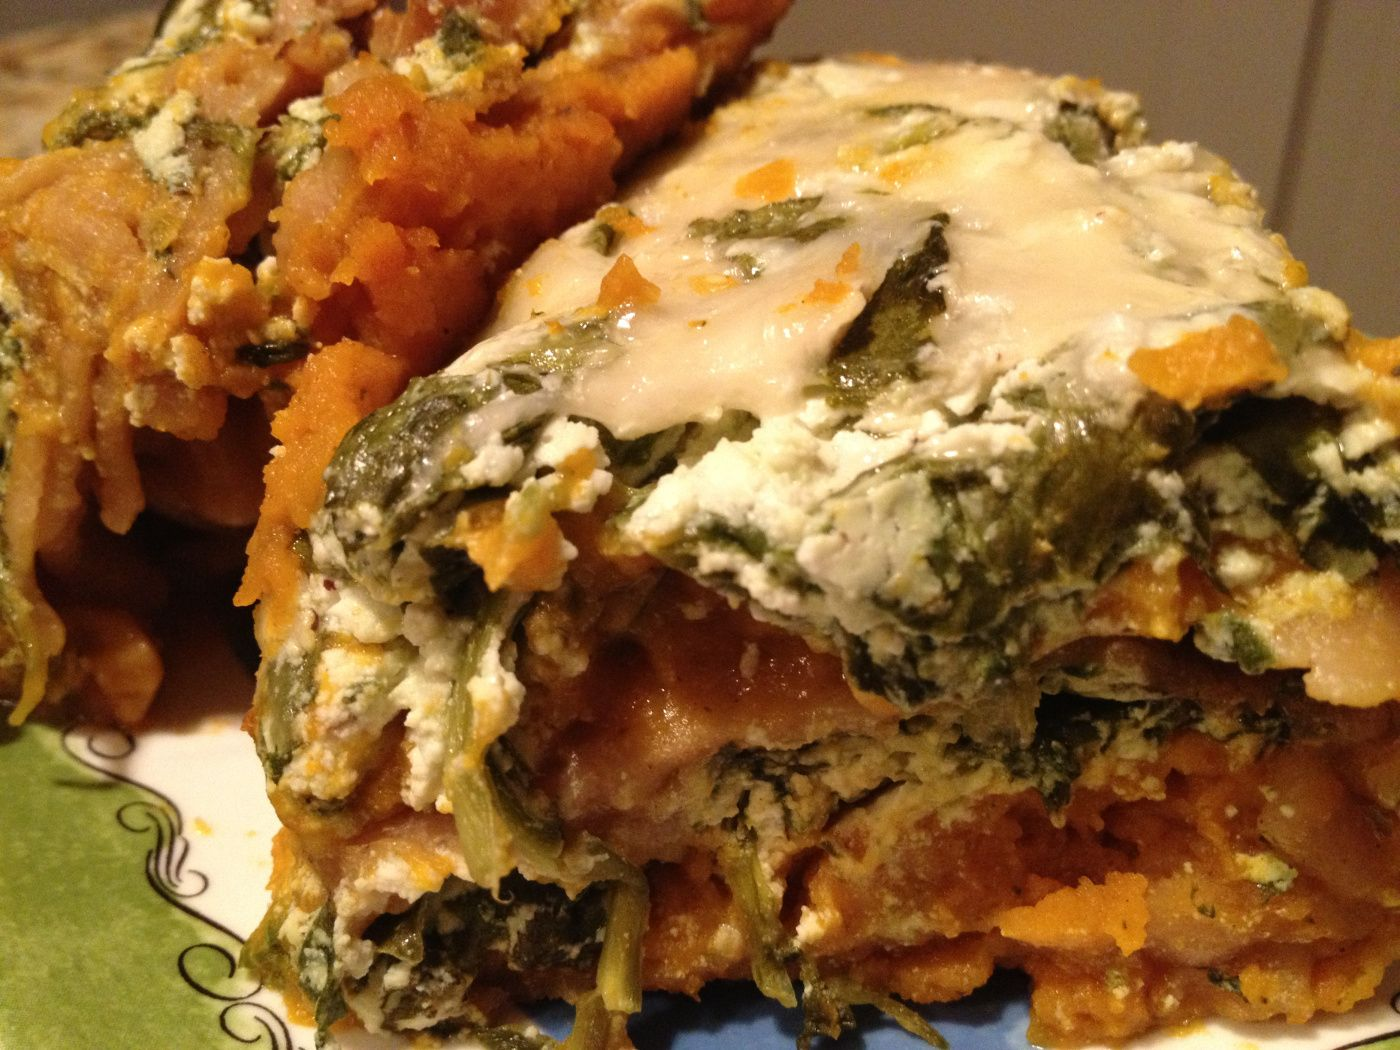 Spinach butternut squash lasagna